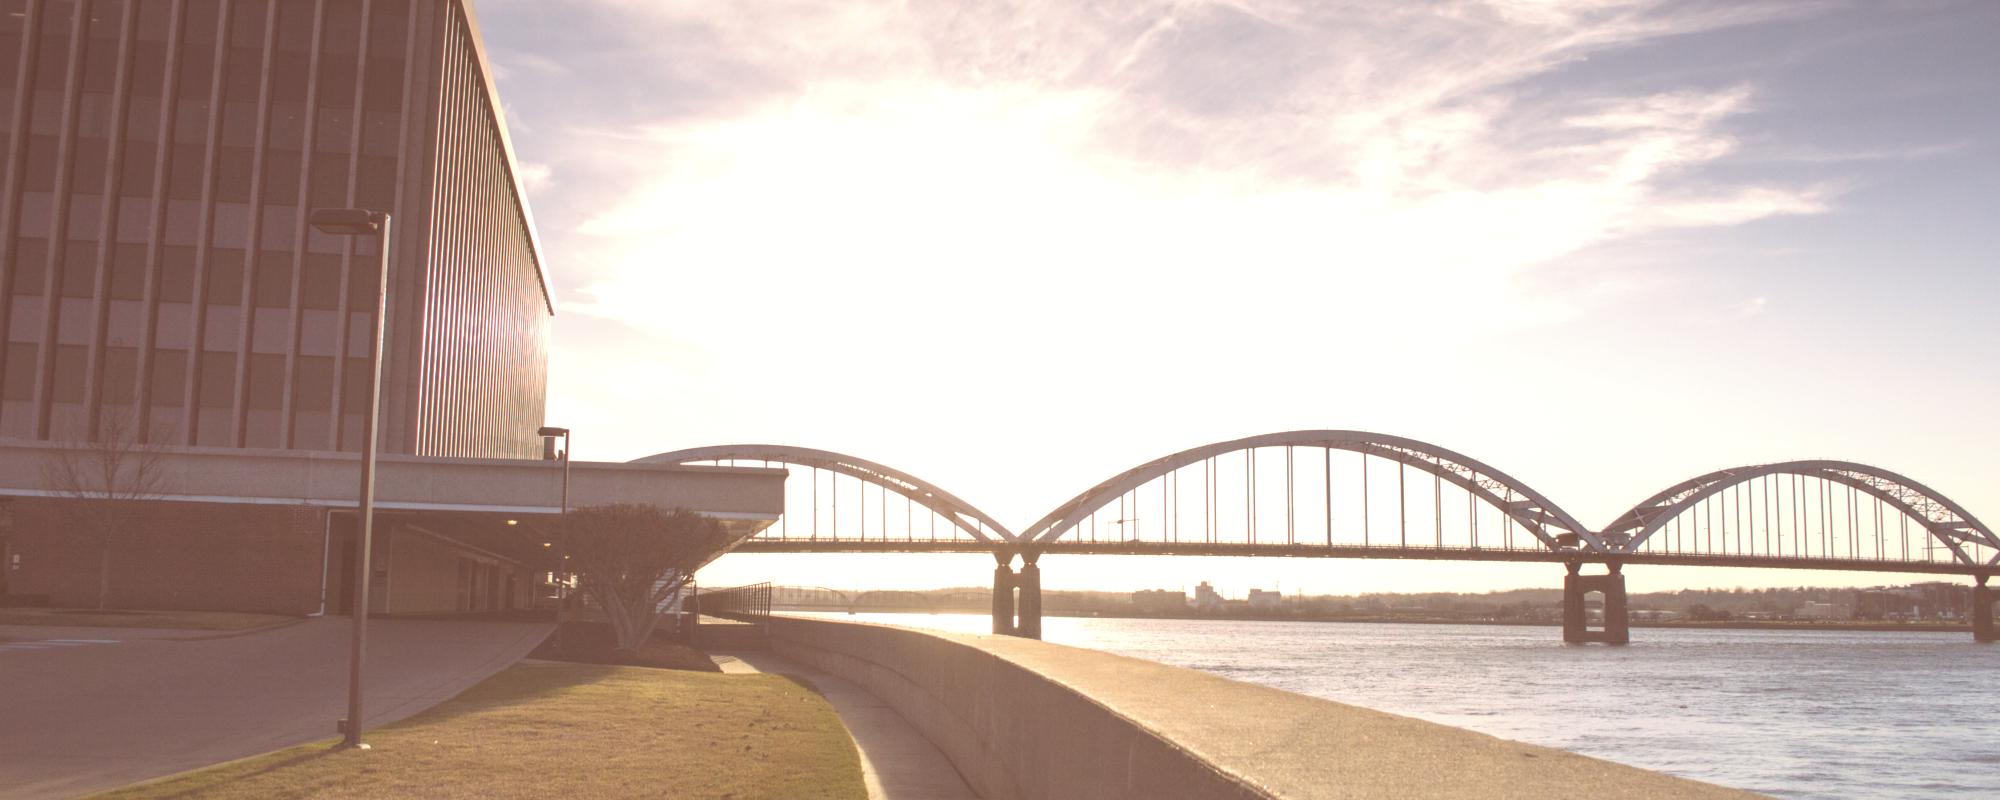 Centennial-Bridge-e1489347531337-washed